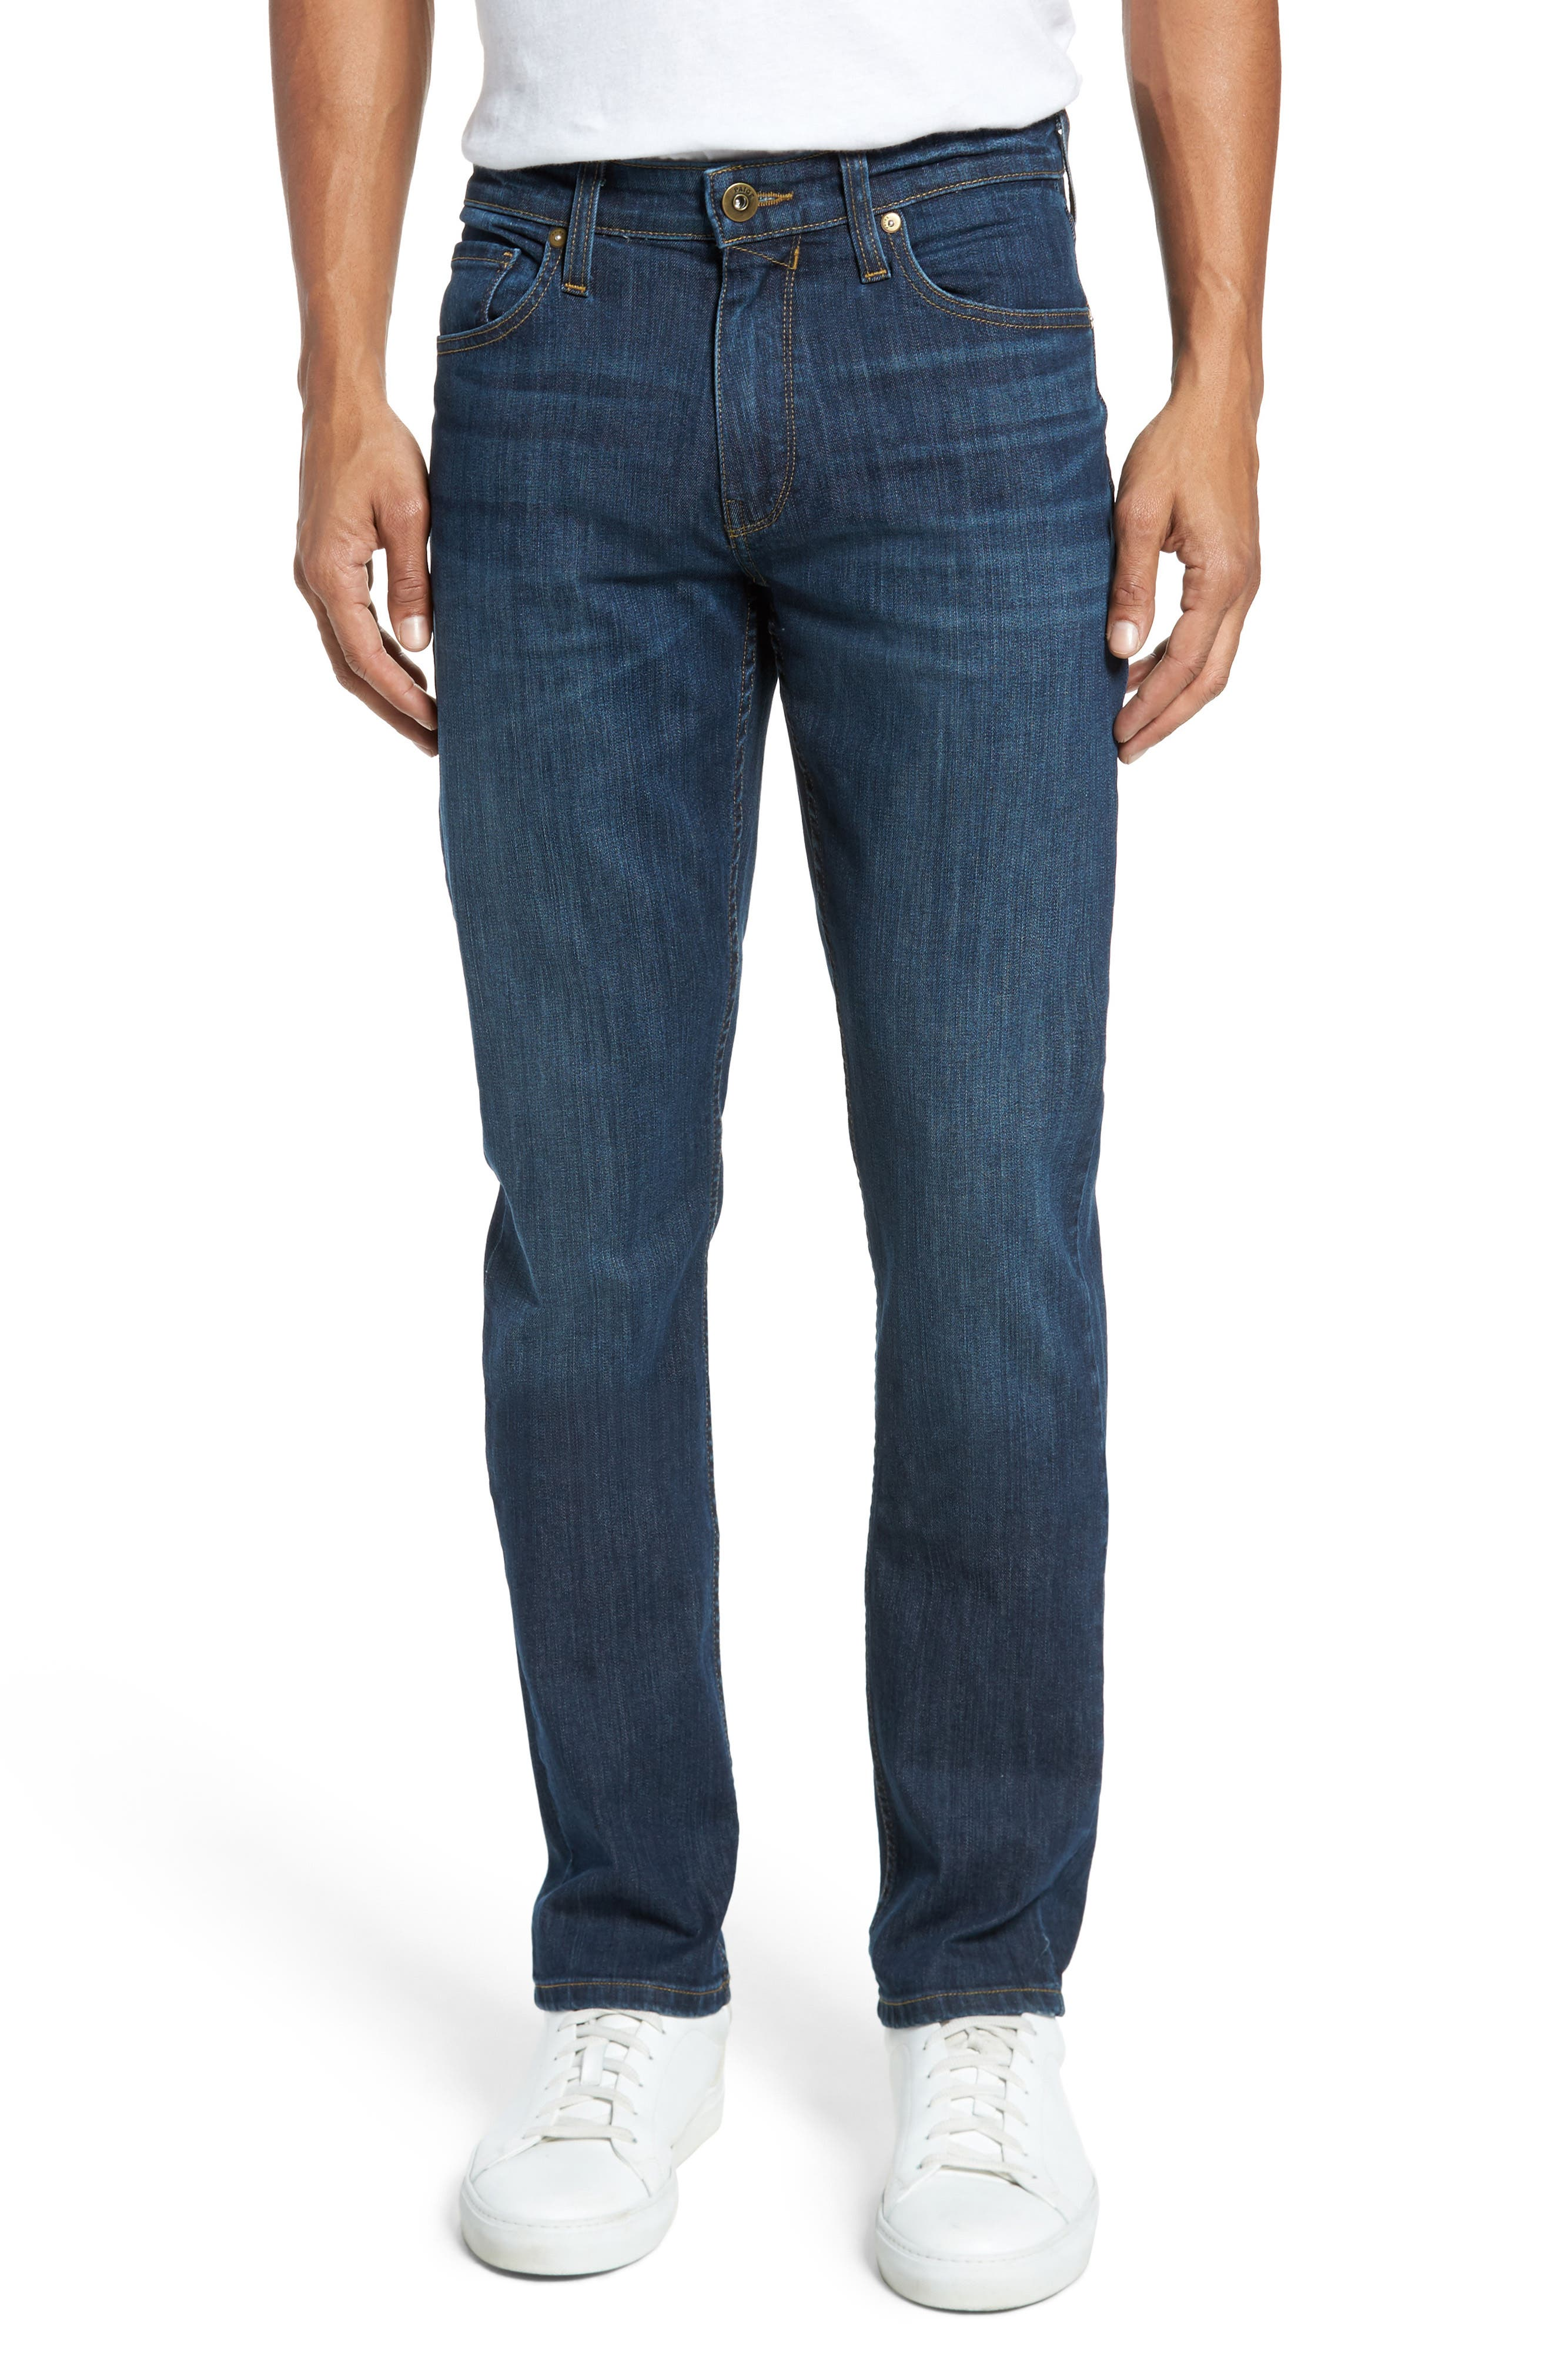 Alternate Image 1 Selected - PAIGE Lennox Slim Fit Jeans (Ridge)